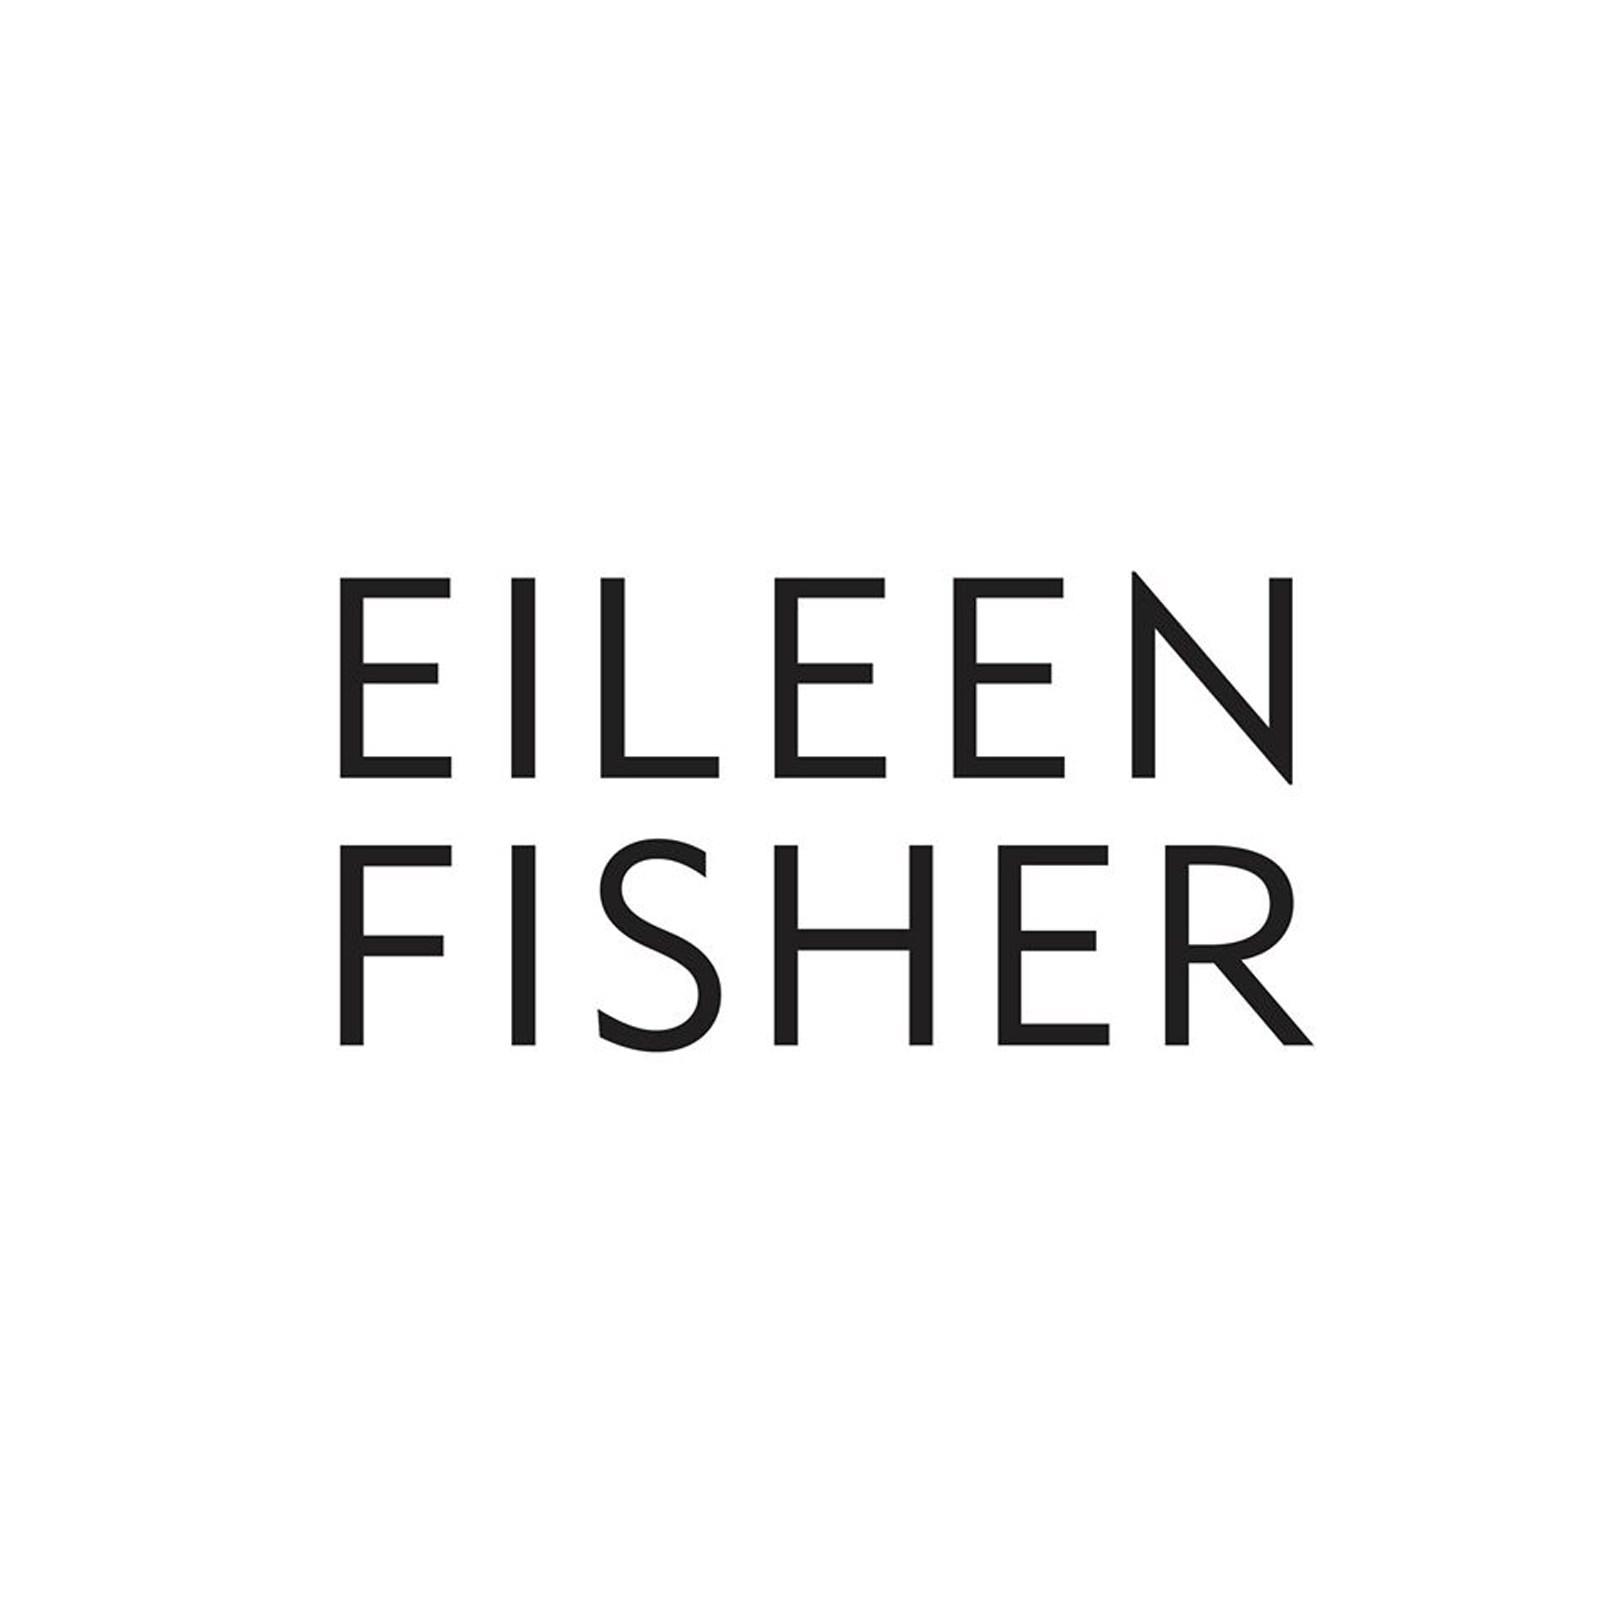 EILEEN-FISHER-1612.jpg